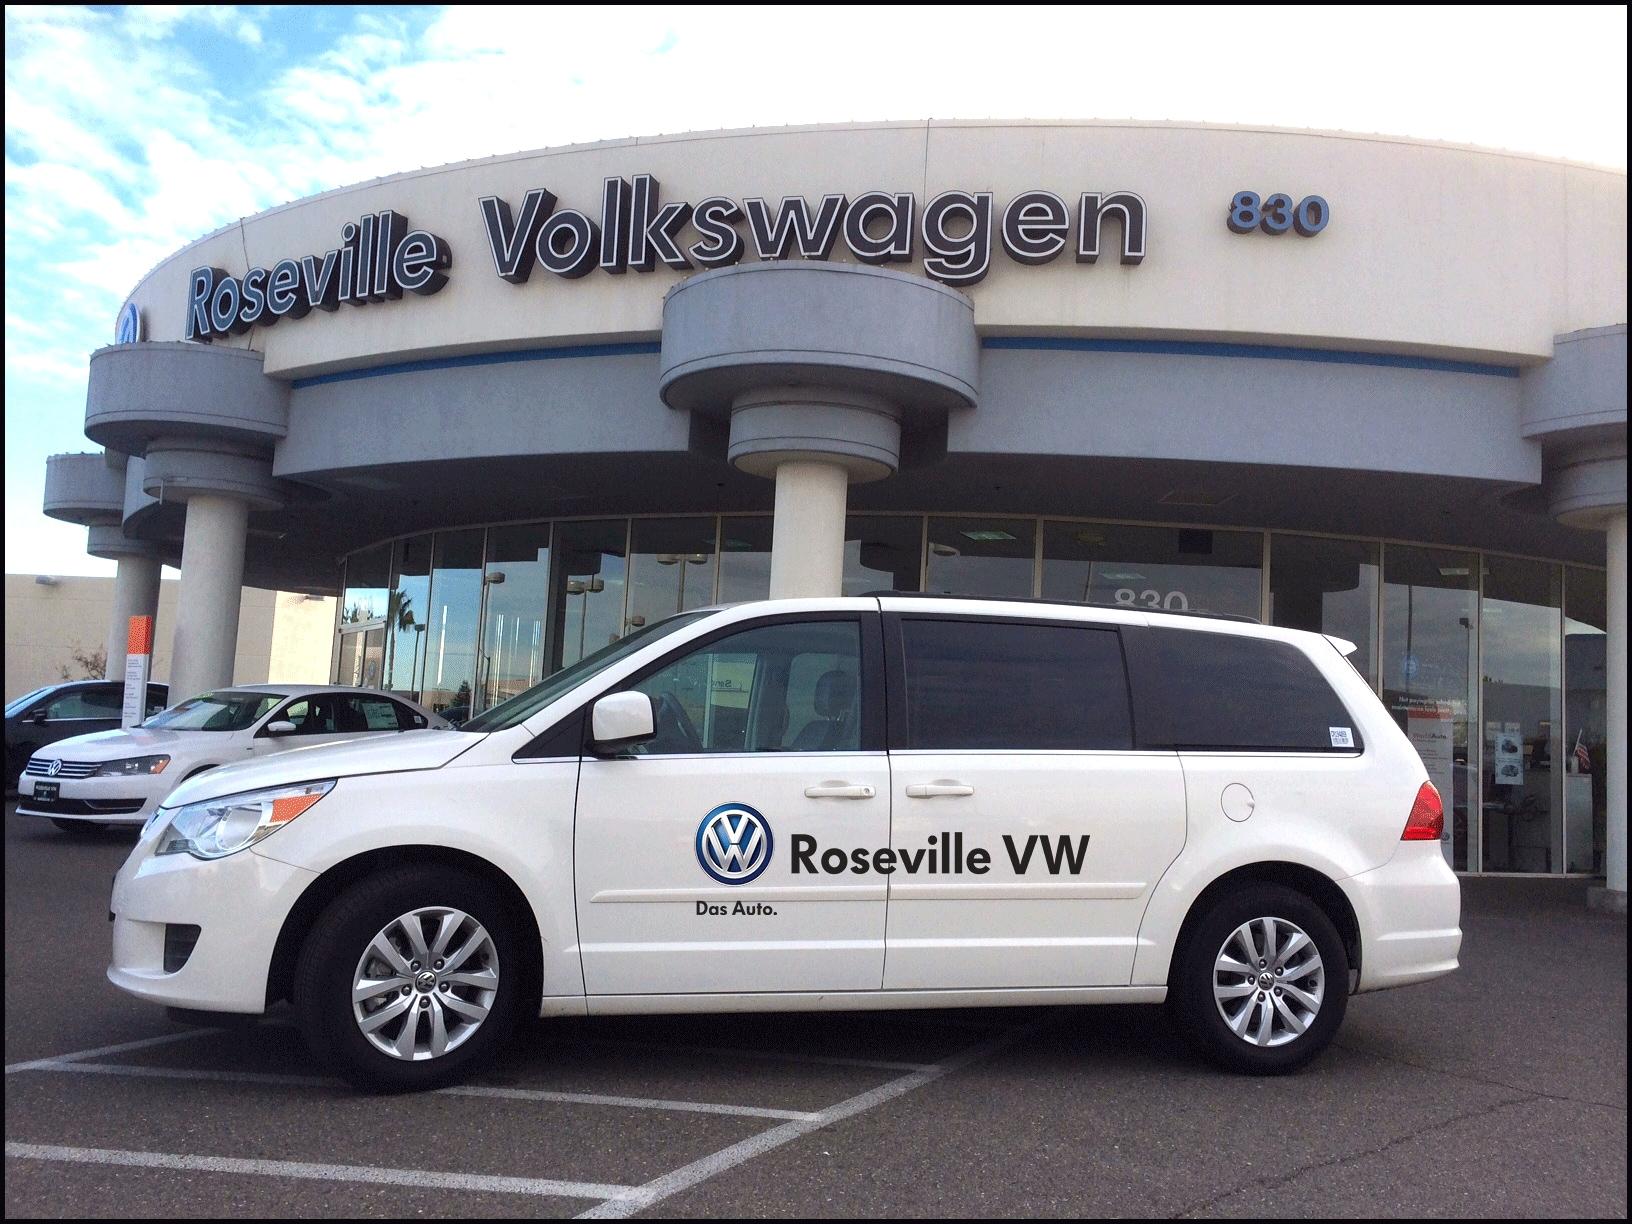 roseville volkswagen  volkswagen dealership  roseville ca